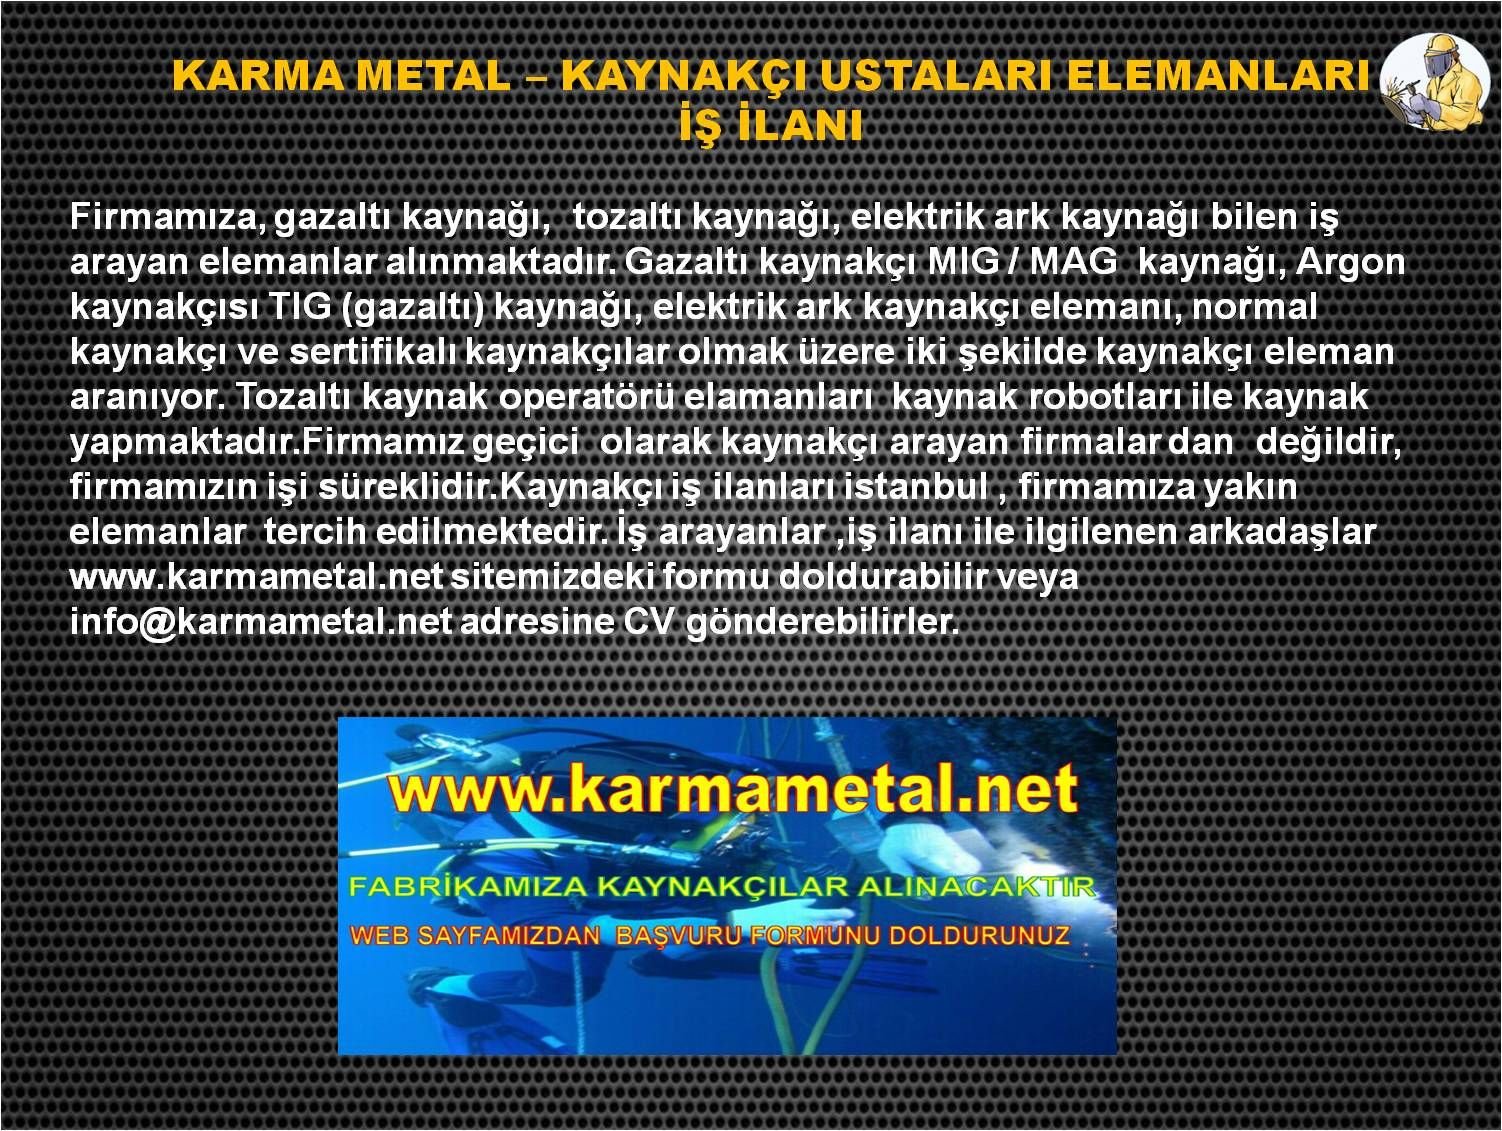 karma metal kaynakci eleman is ilanlari ilani istanbul esenyurt kirac avcilar beylikduzu corlu silivri degirmenkoy cantakoy selimpasa cerkezkoy yati karma metal